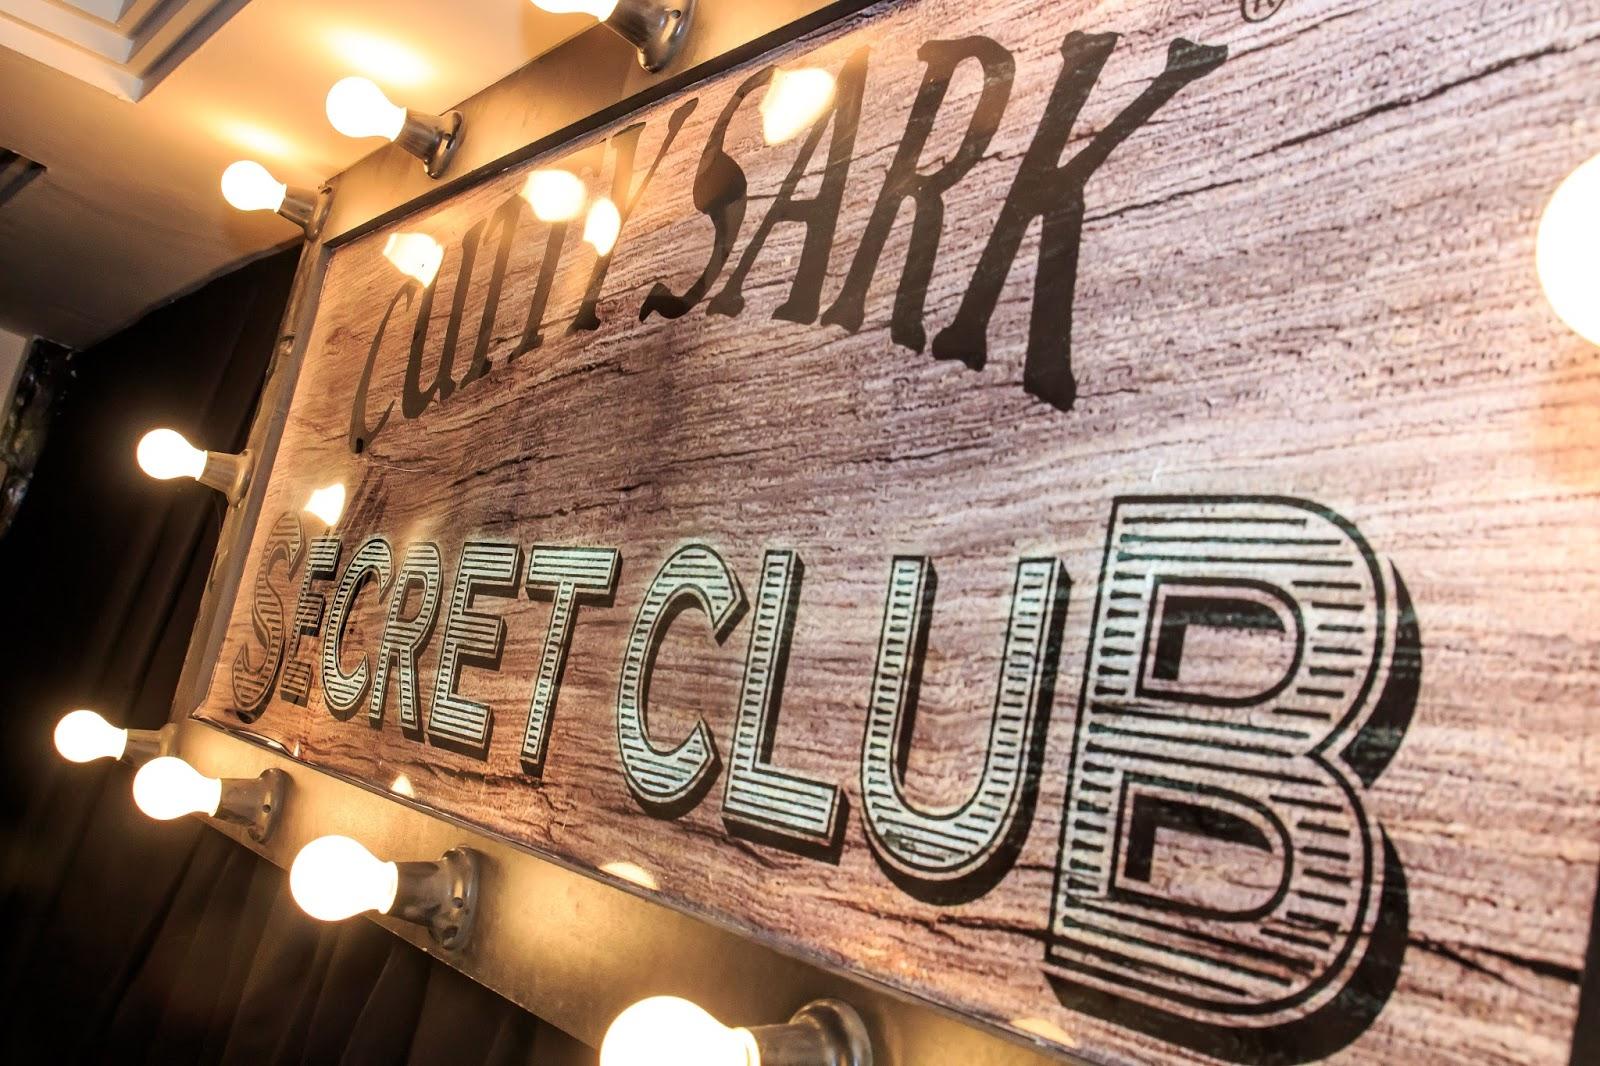 las-mejores-fiestas-madrid-cutty-shark-secret-club